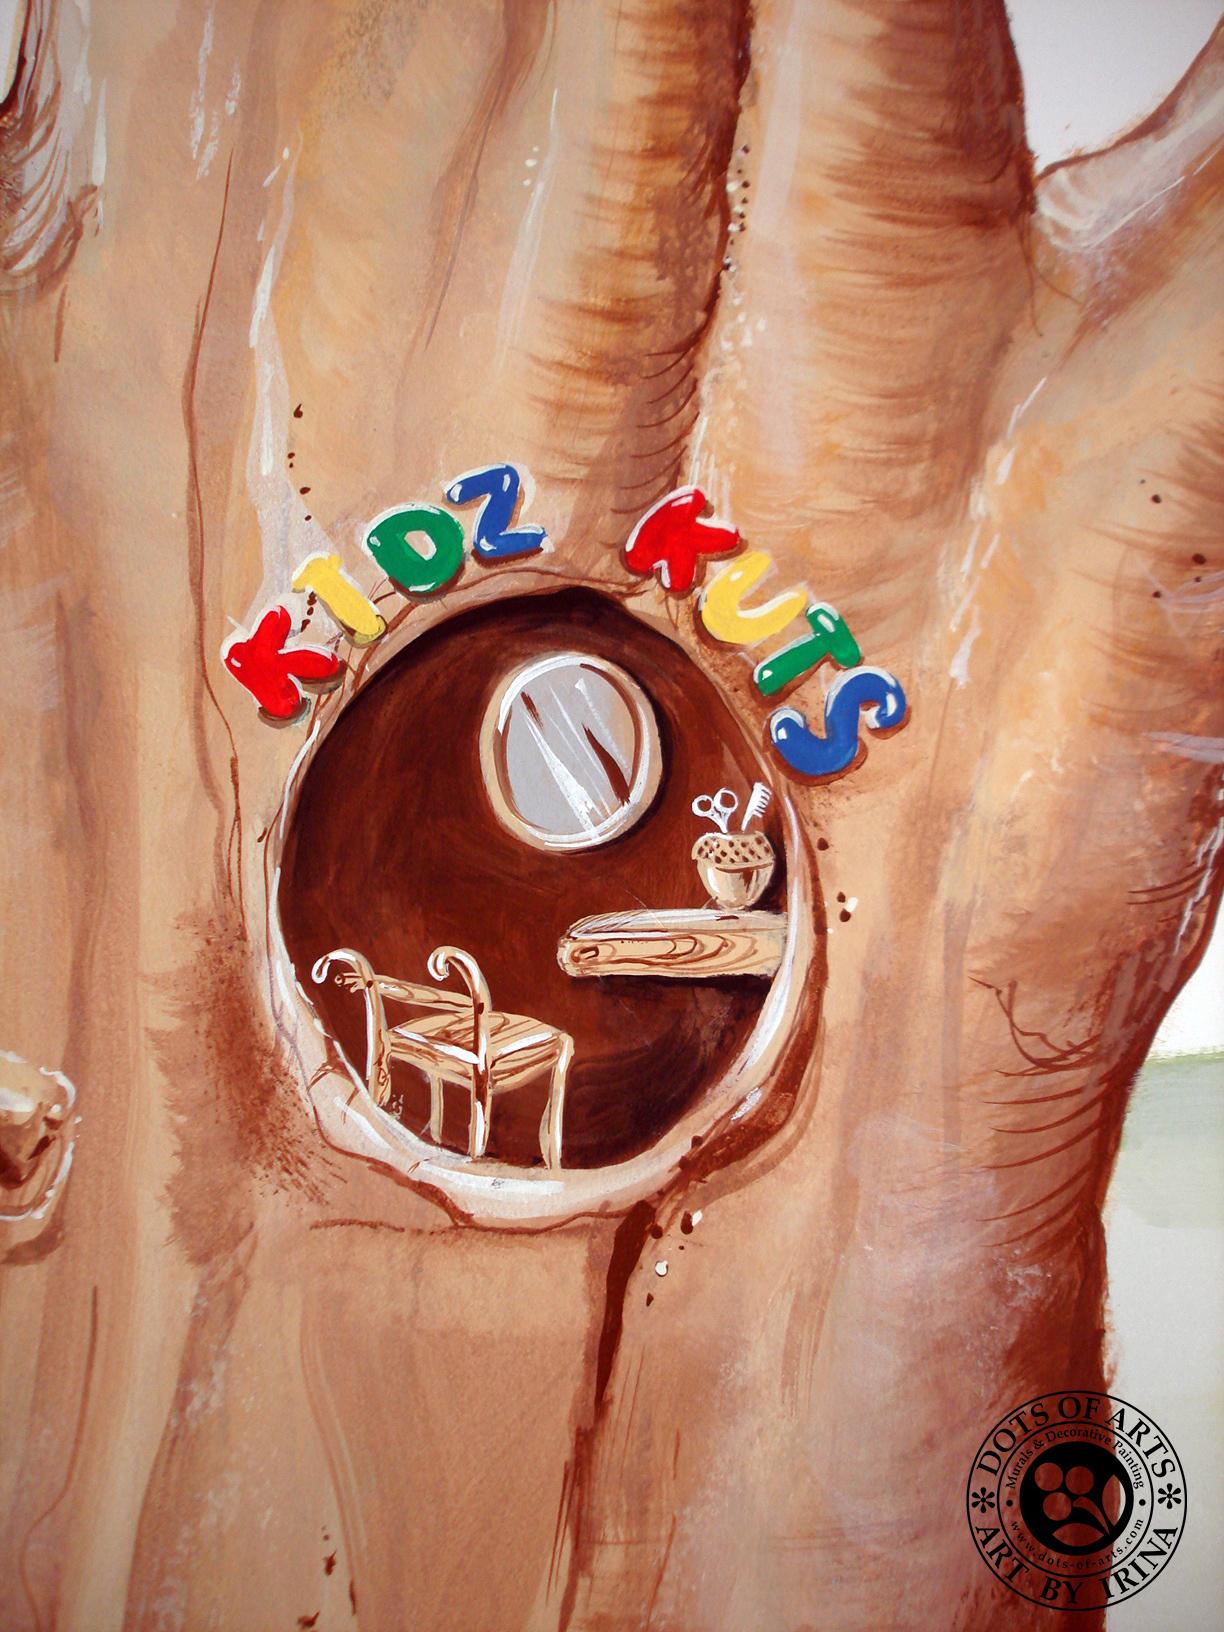 mural-custom-wall-commercial-kidz-kuts-woodbridge-nj-dots-of-arts-squirrel-salon.jpg